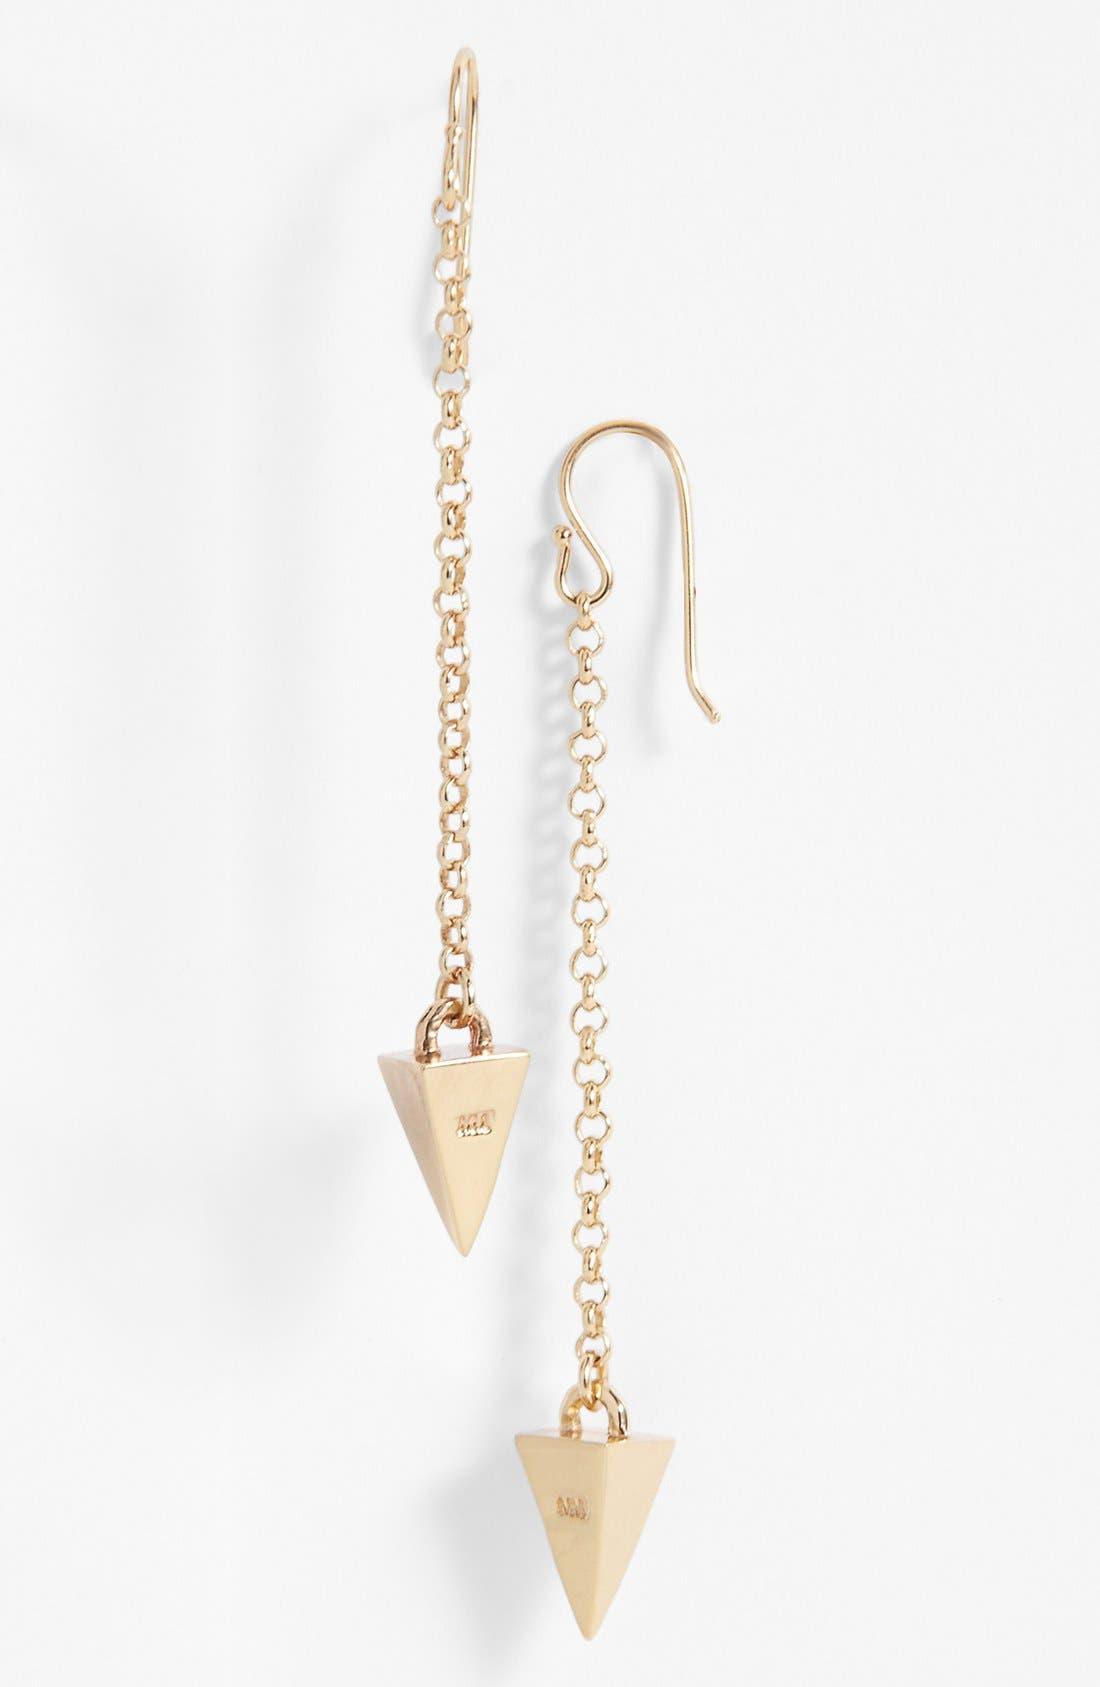 Main Image - Melinda Maria 'Pyramid' Linear Earrings